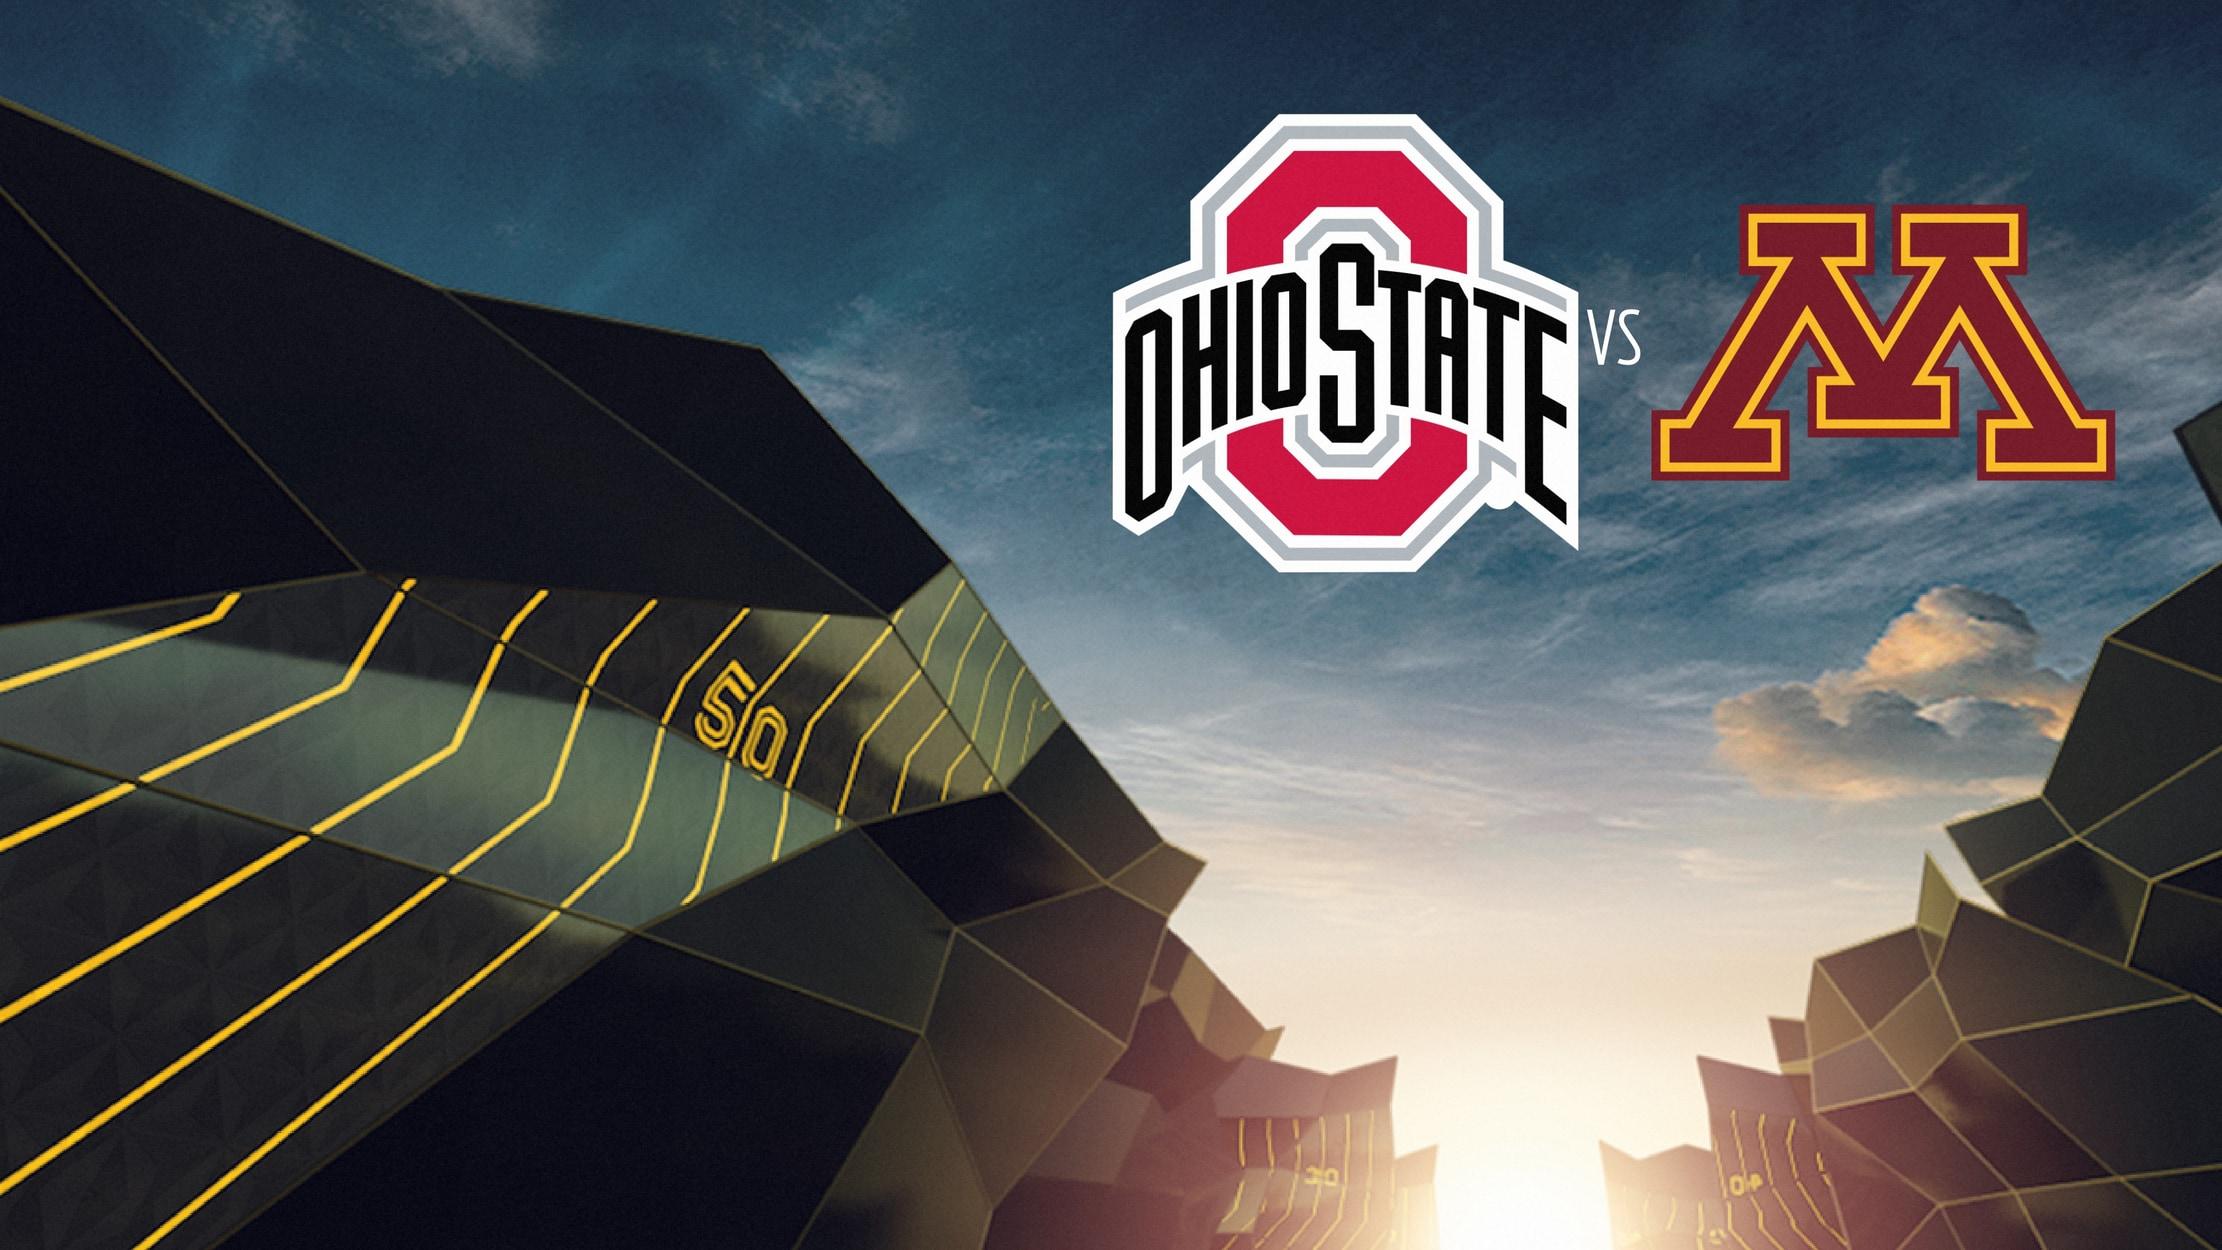 College Football - Ohio State at Minnesota seriesDetail